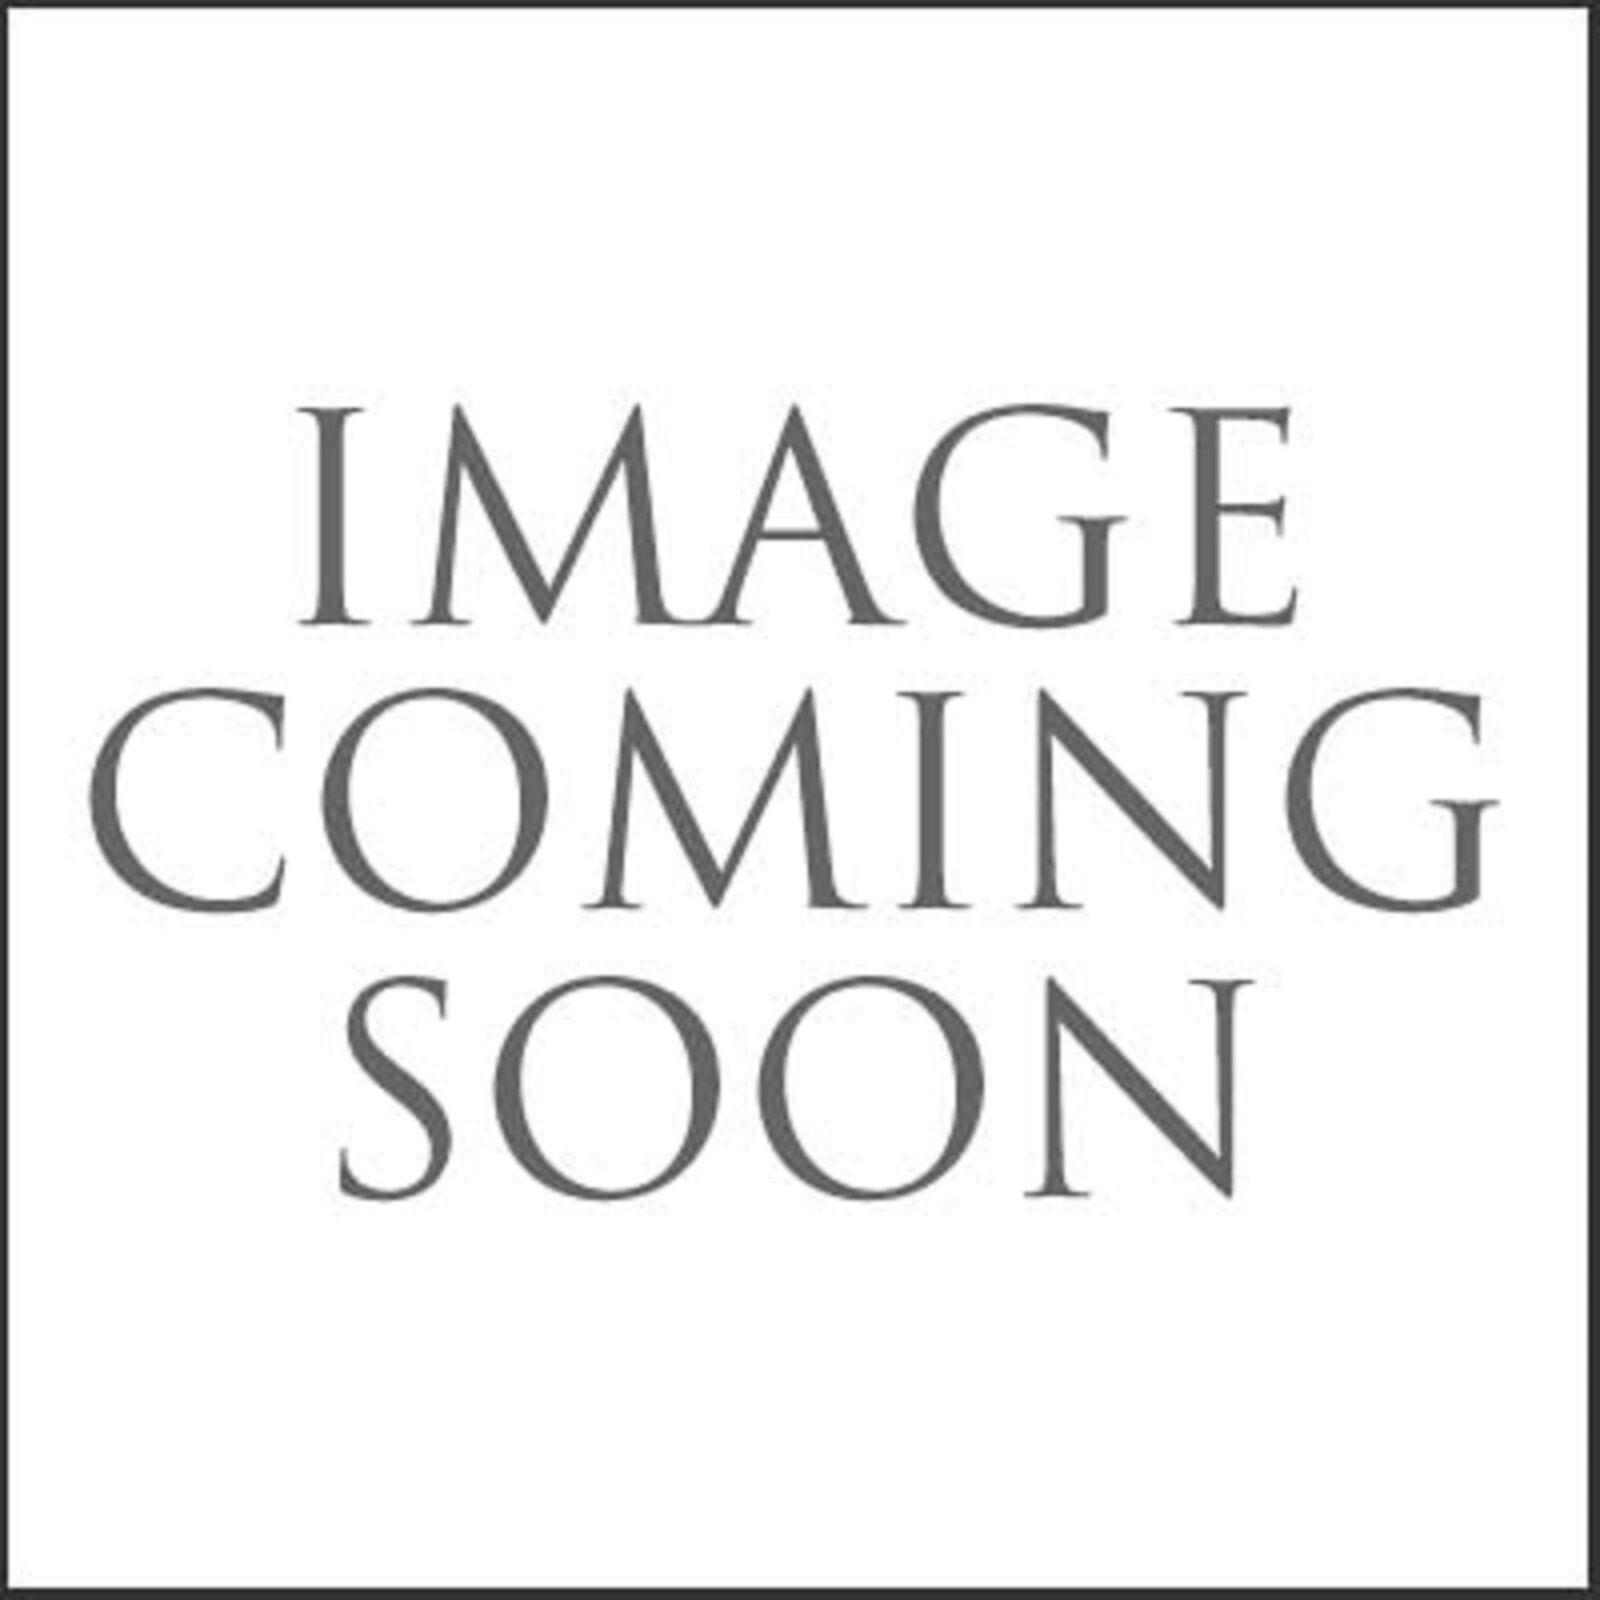 Shimano Slx FC-M7000 11 Geschwindigkeit 170 mm Kurbelgarnitur ohne Kettenblatt